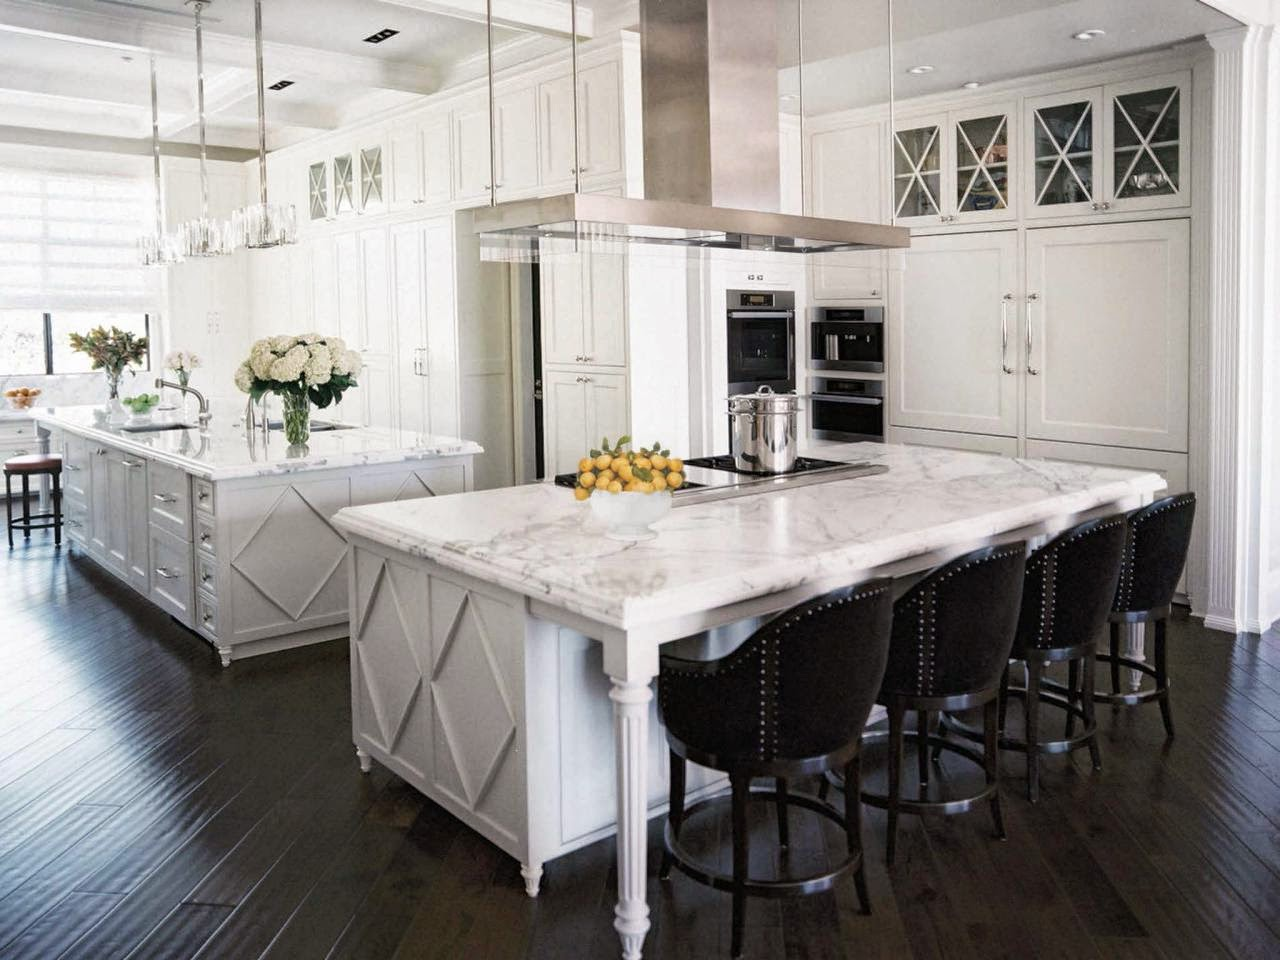 Landon Homes : Envy-Worthy Kitchen Cabinets